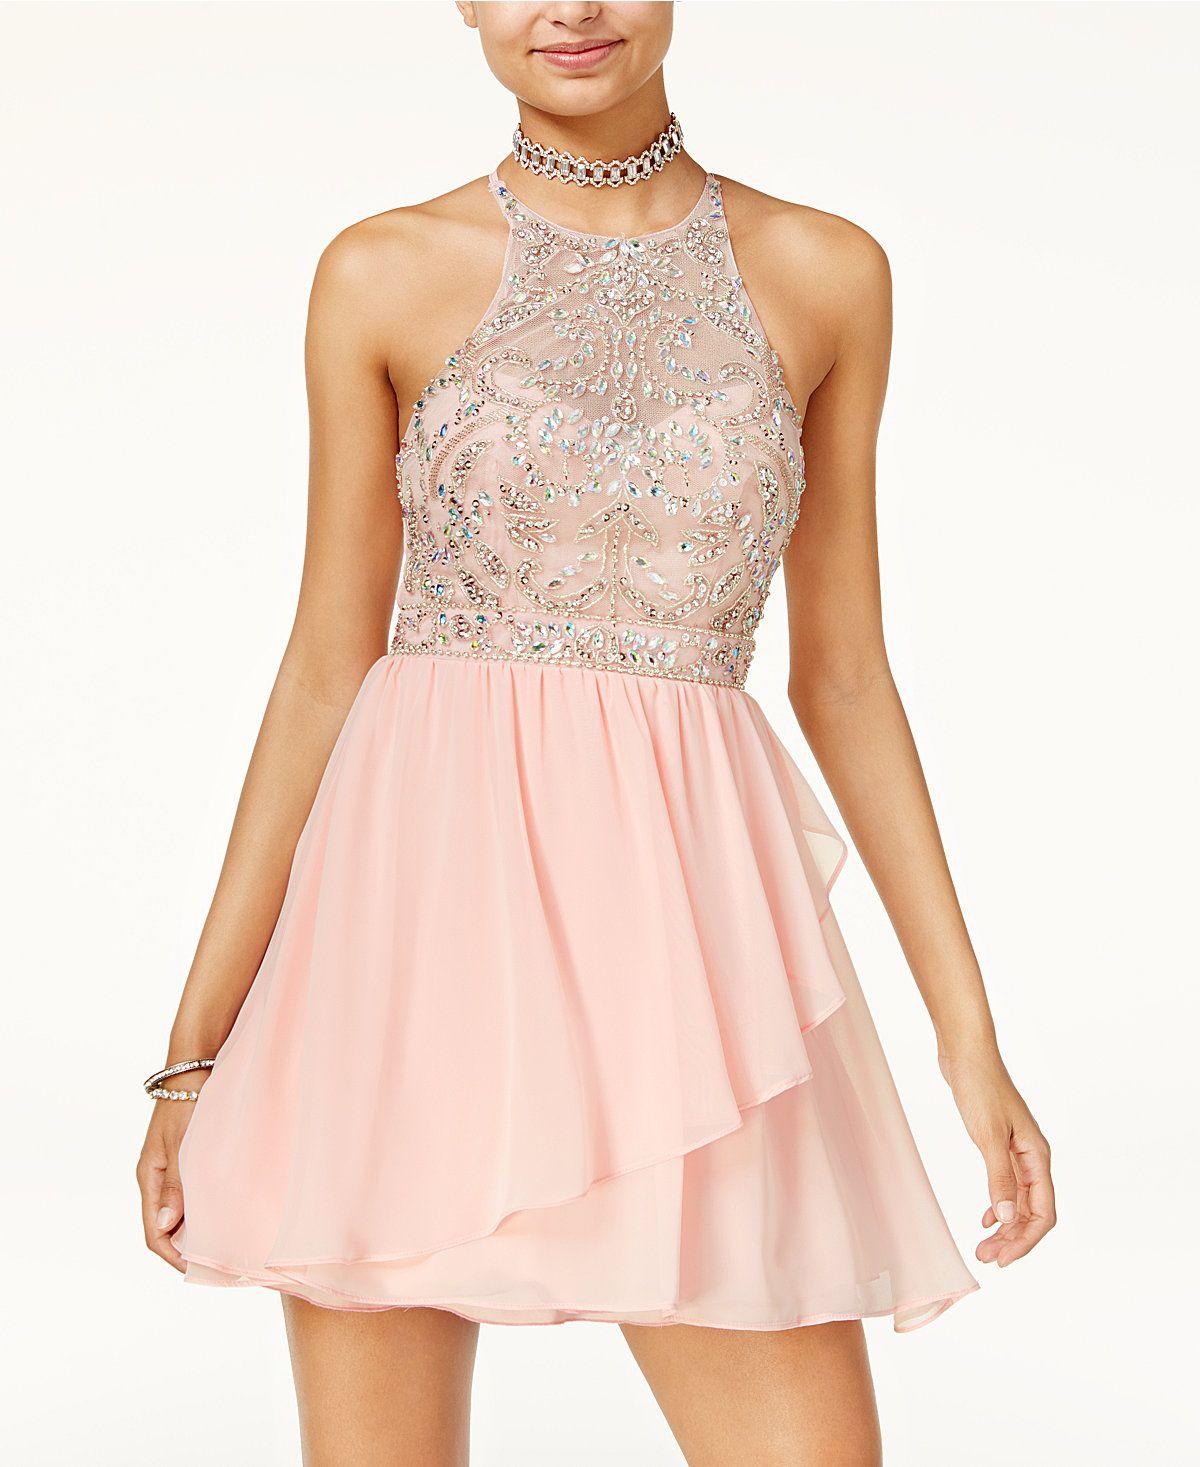 a8bed1229 B Darlin Juniors' Embellished Fit & Flare Dress - Juniors Dresses - Macy's